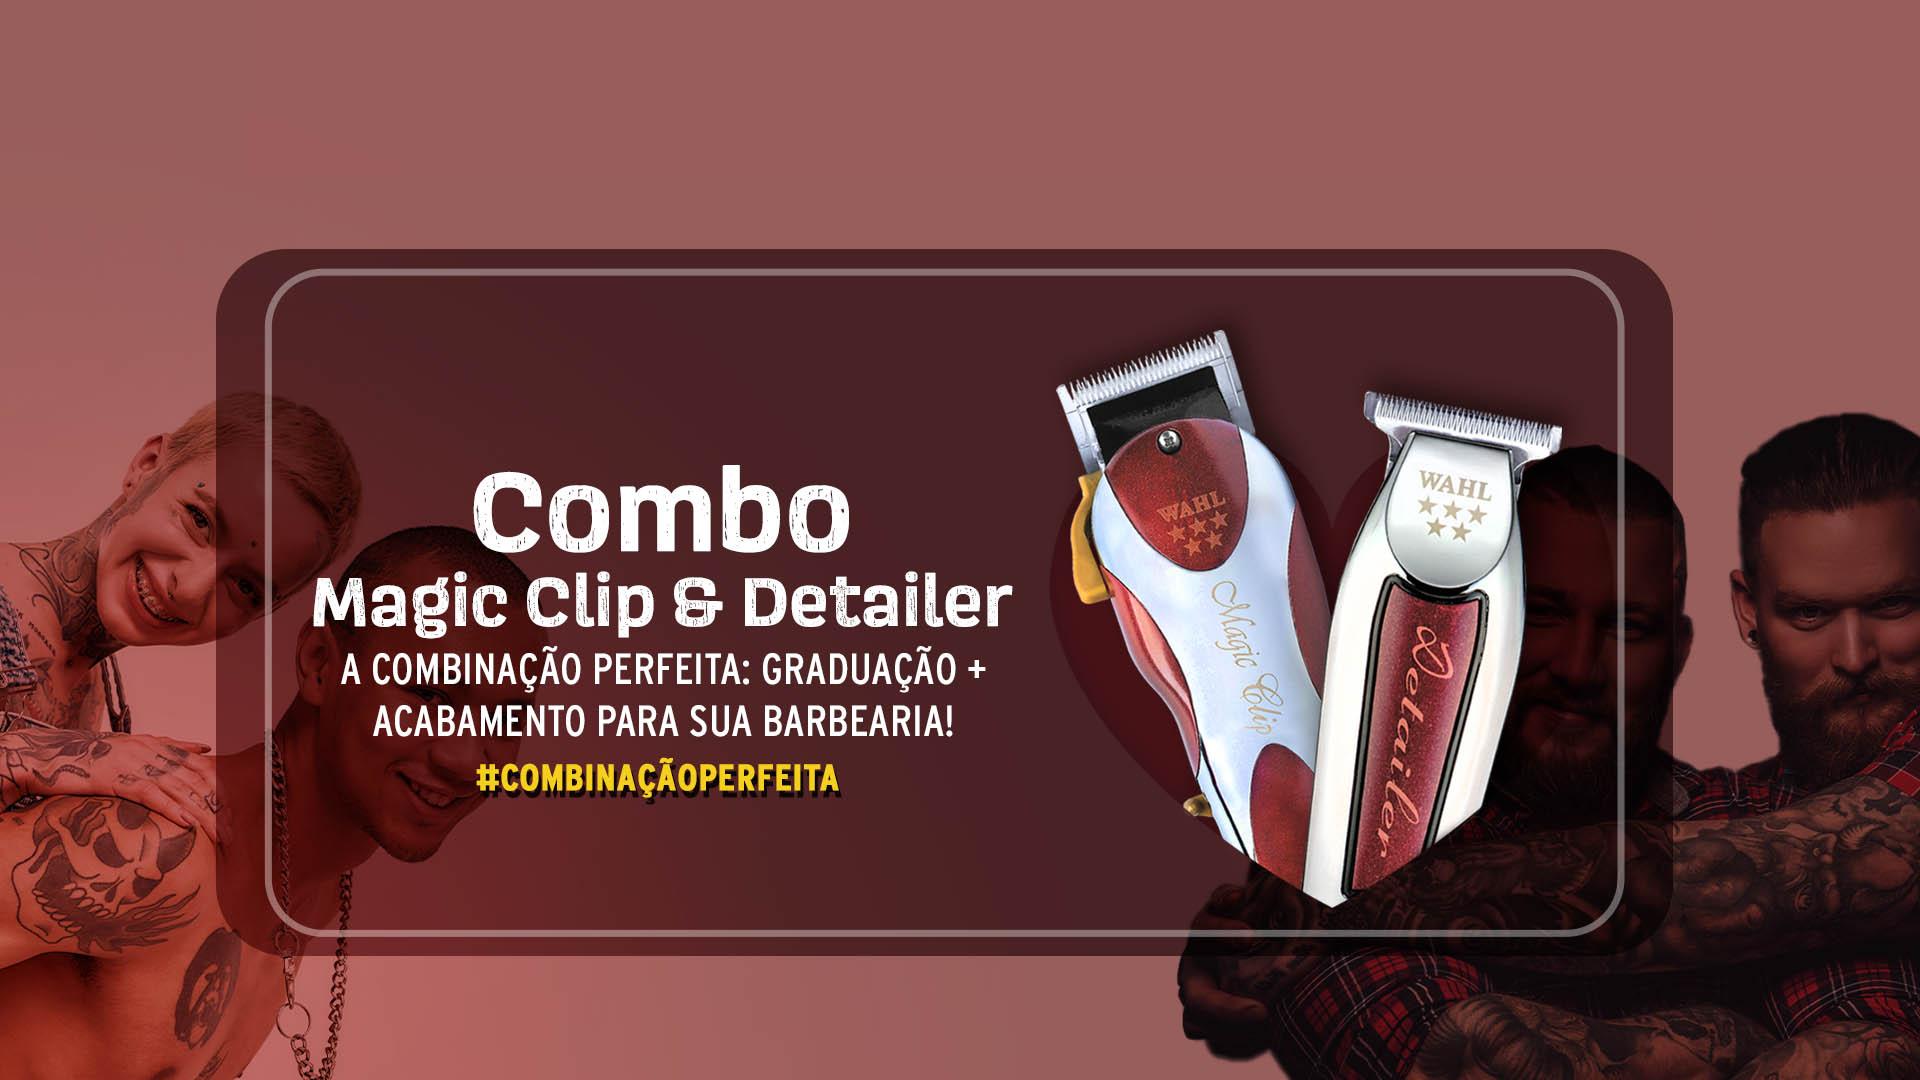 Combo-Magic-Detailer-desktop